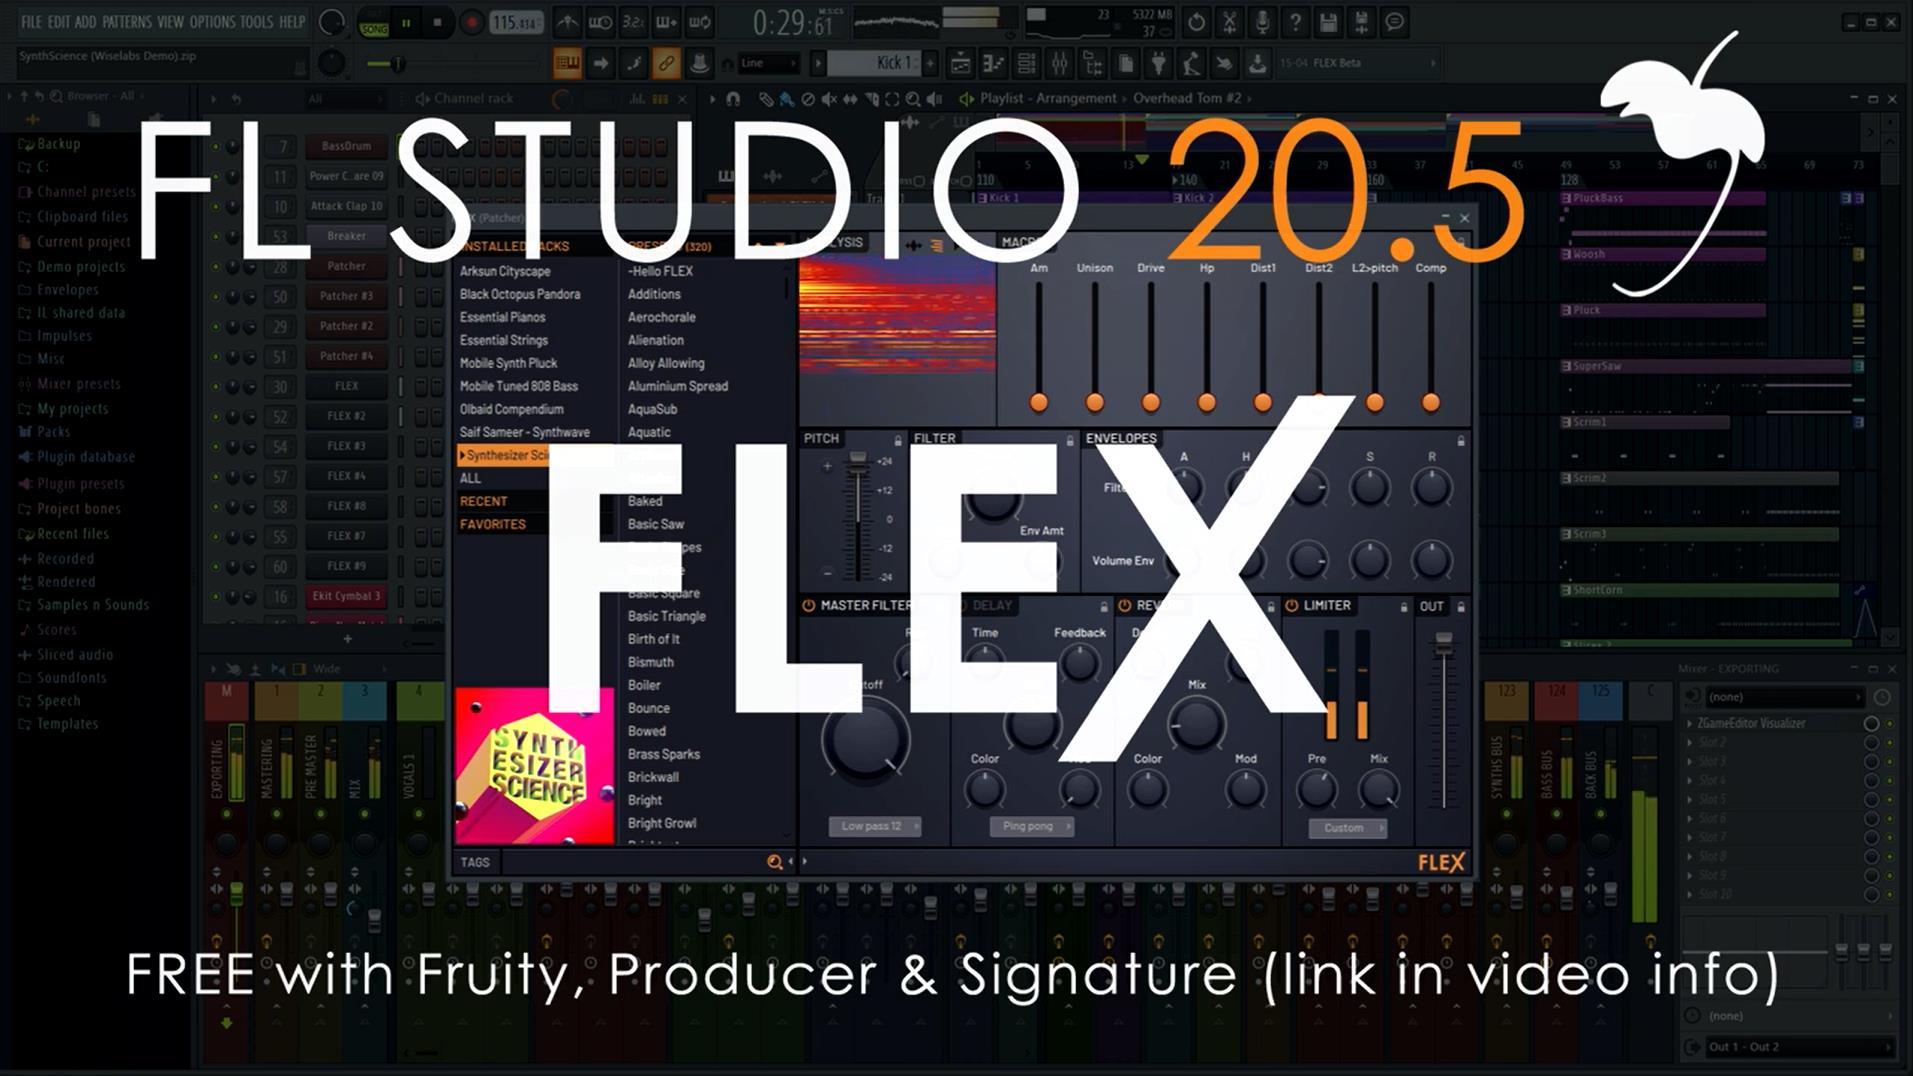 FL studio 20.5